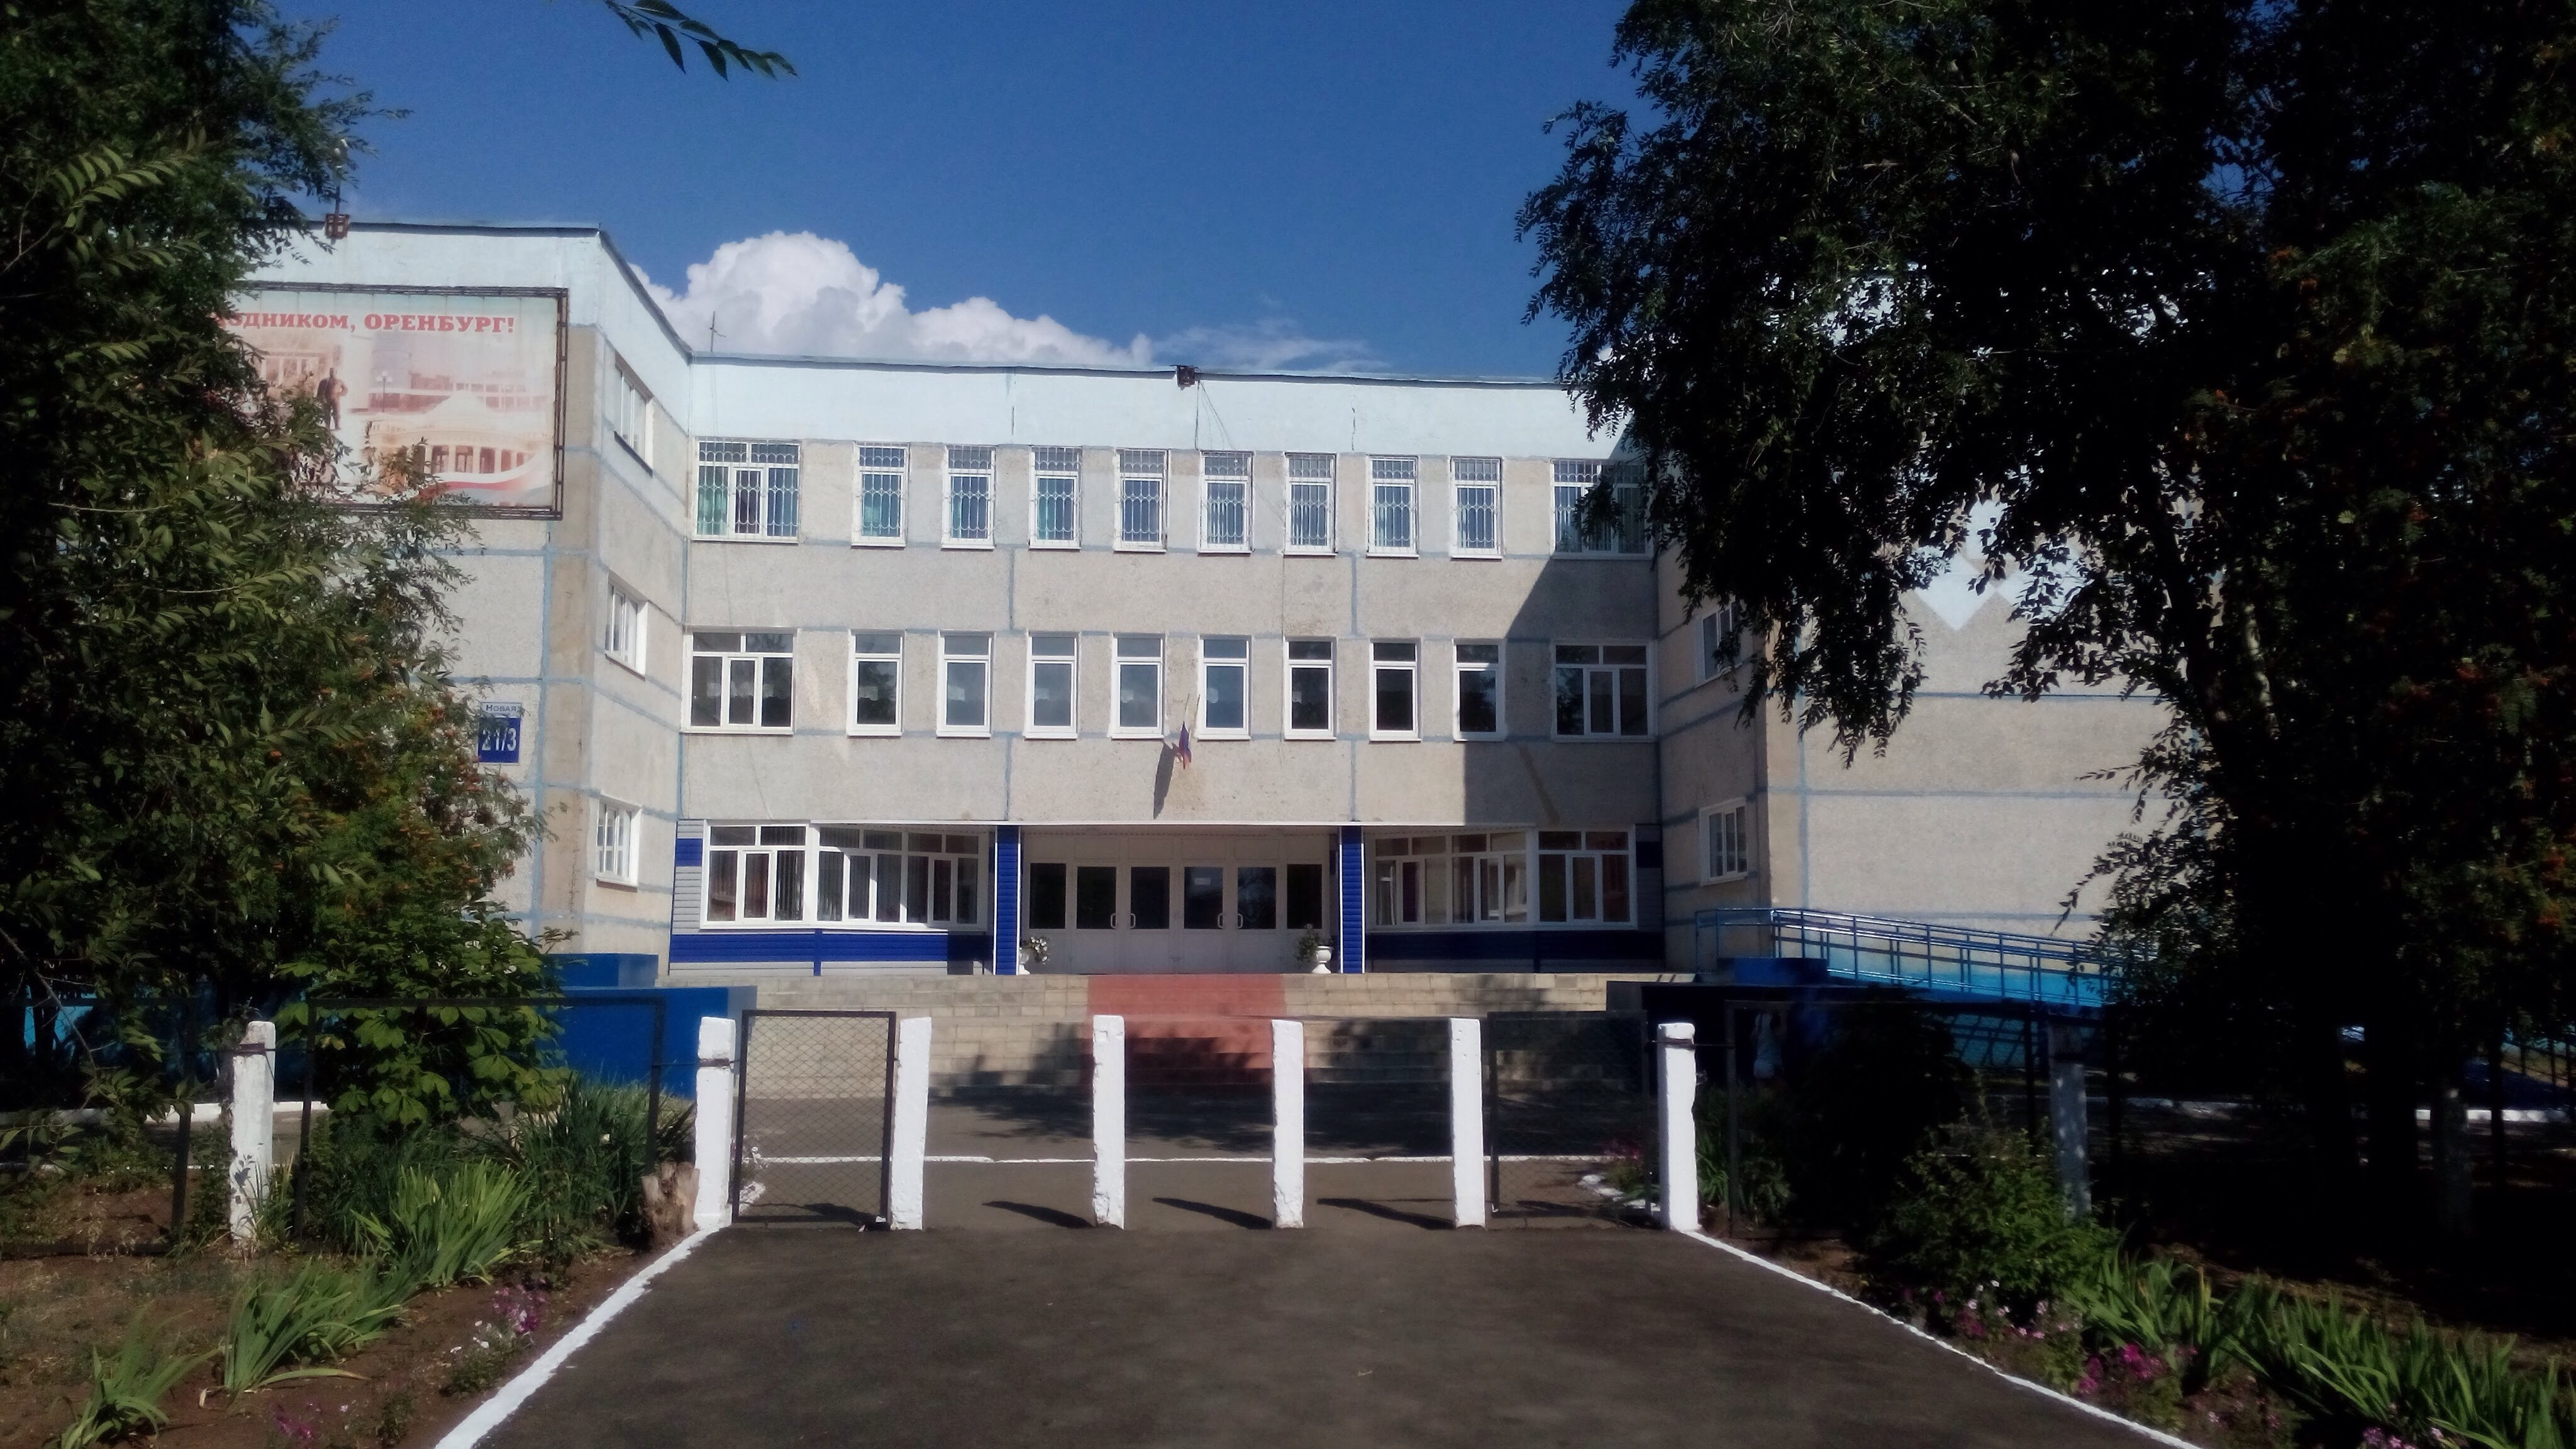 Картинки школ оренбурга